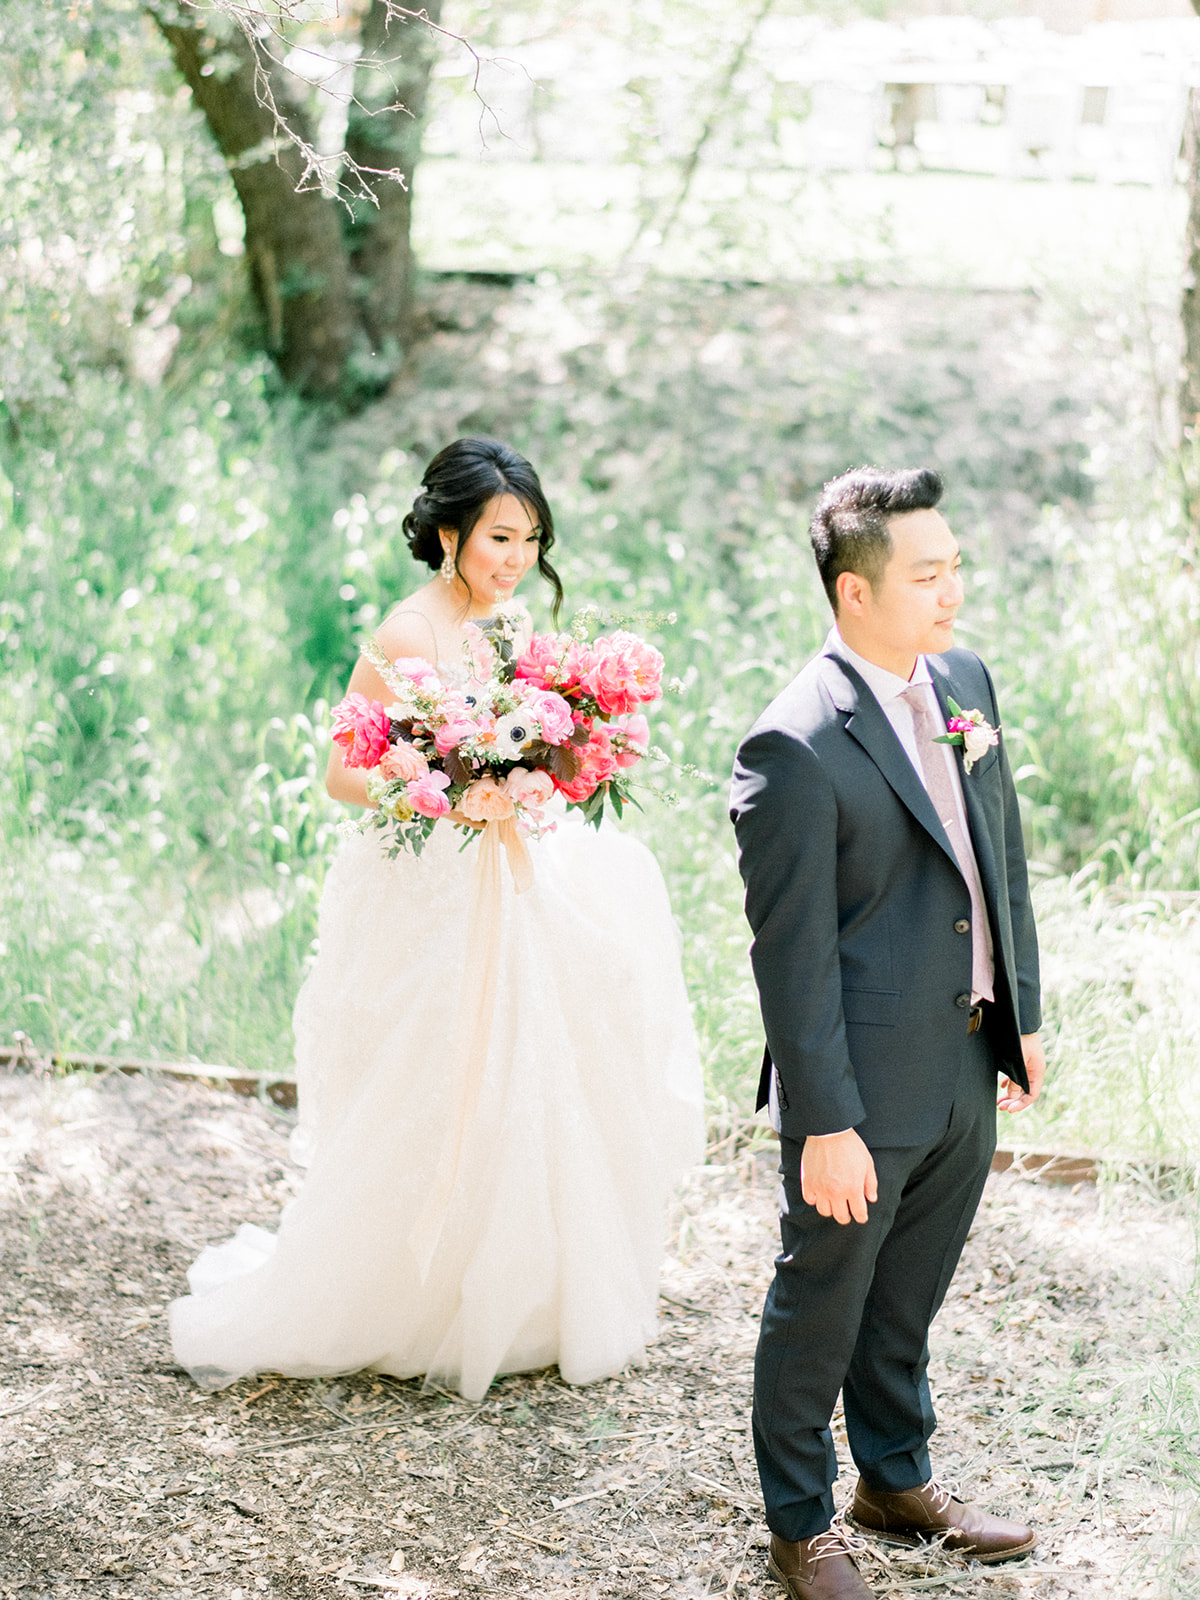 jueunandjon-etherandsmith-wedding-280.jpg